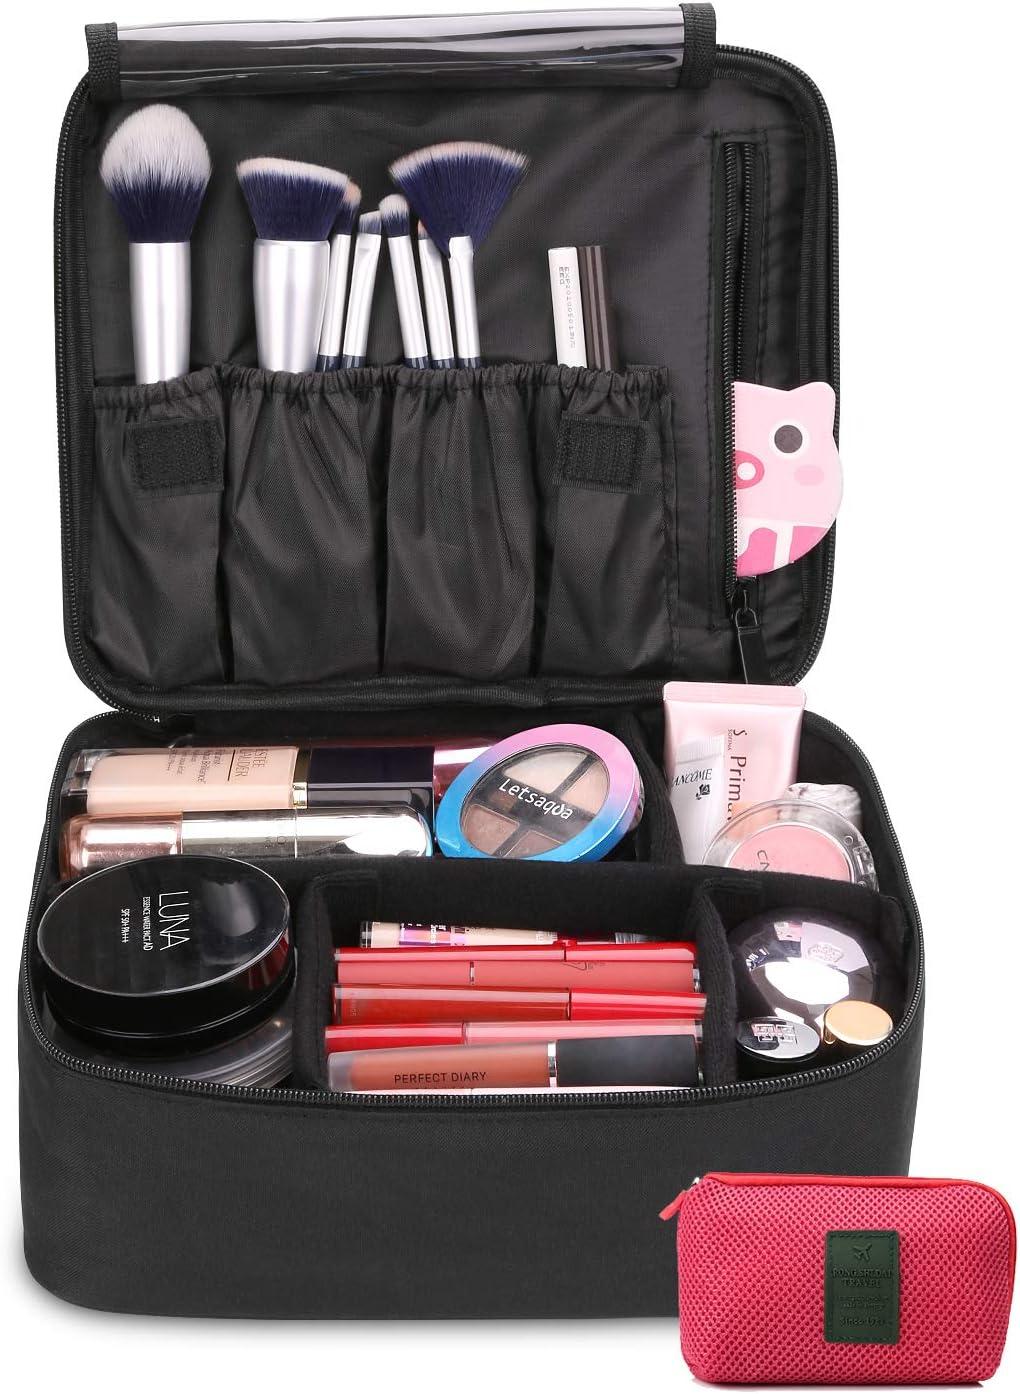 DIMJ Neceser Maquillaje Portátil, Bolsa de Maquillaje Ligera con Divisores Bolsillos Profesional Organizador de Maquillaje Bolso de Cosméticos de Viaje con Bolsa de Cable USB